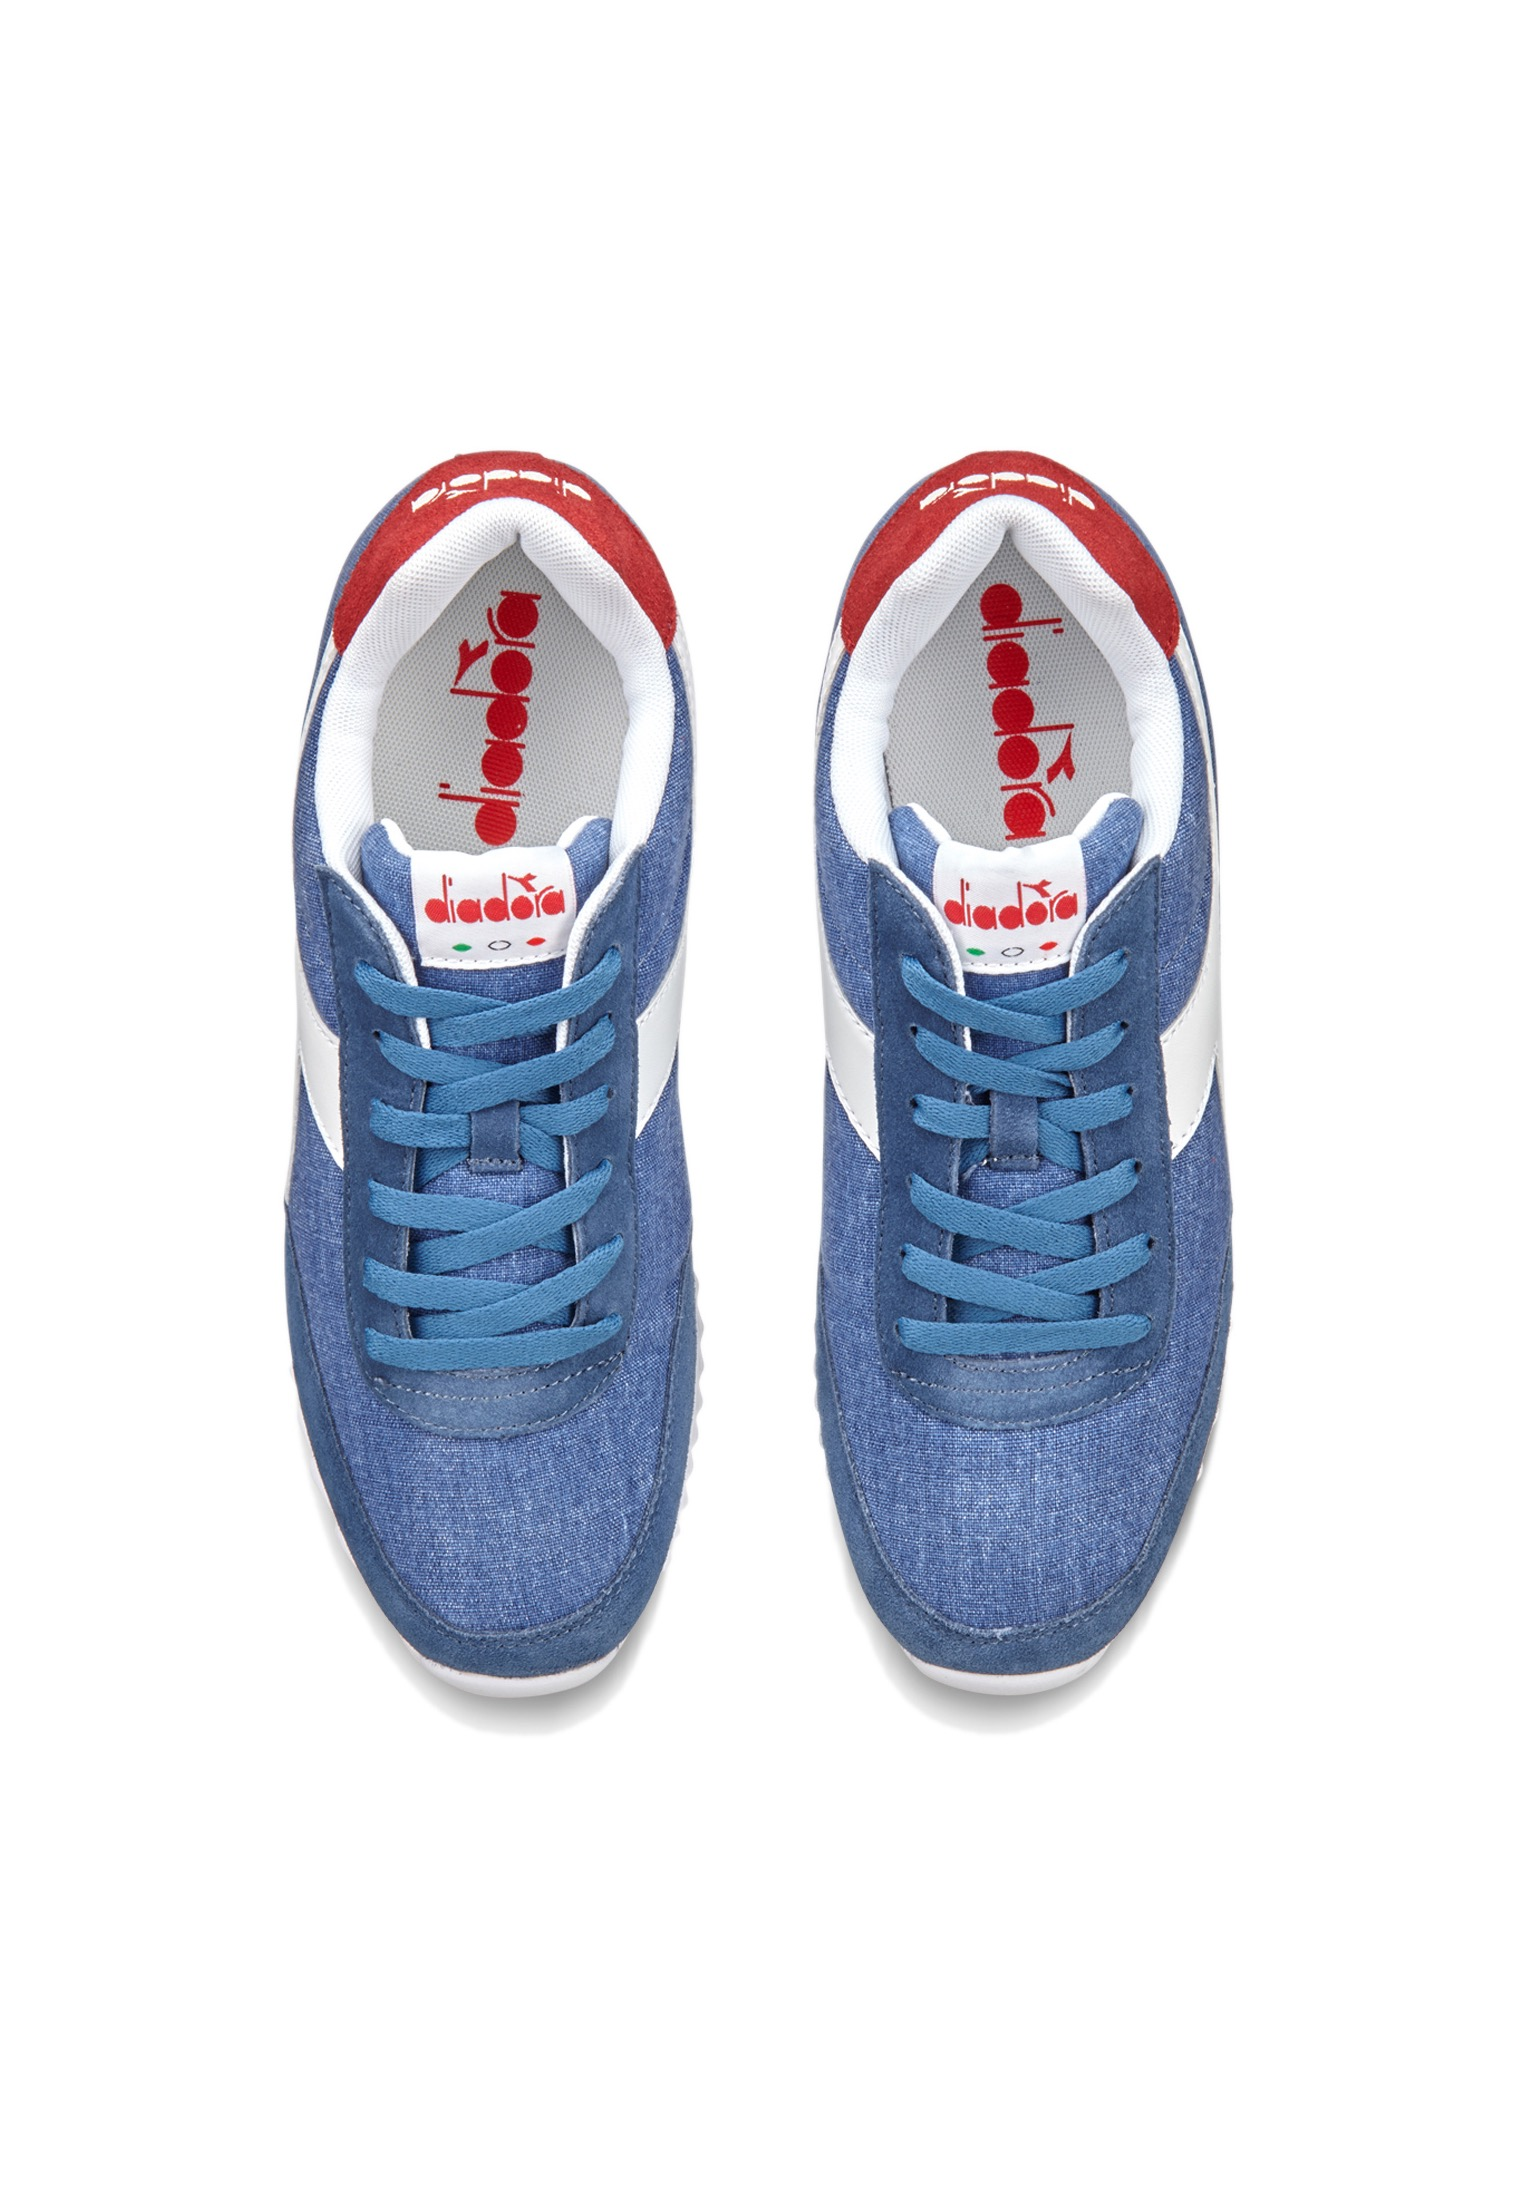 Scarpe-Diadora-Jog-Light-C-Sneakers-sportive-uomo-donna-vari-colori-e-taglie miniatura 34